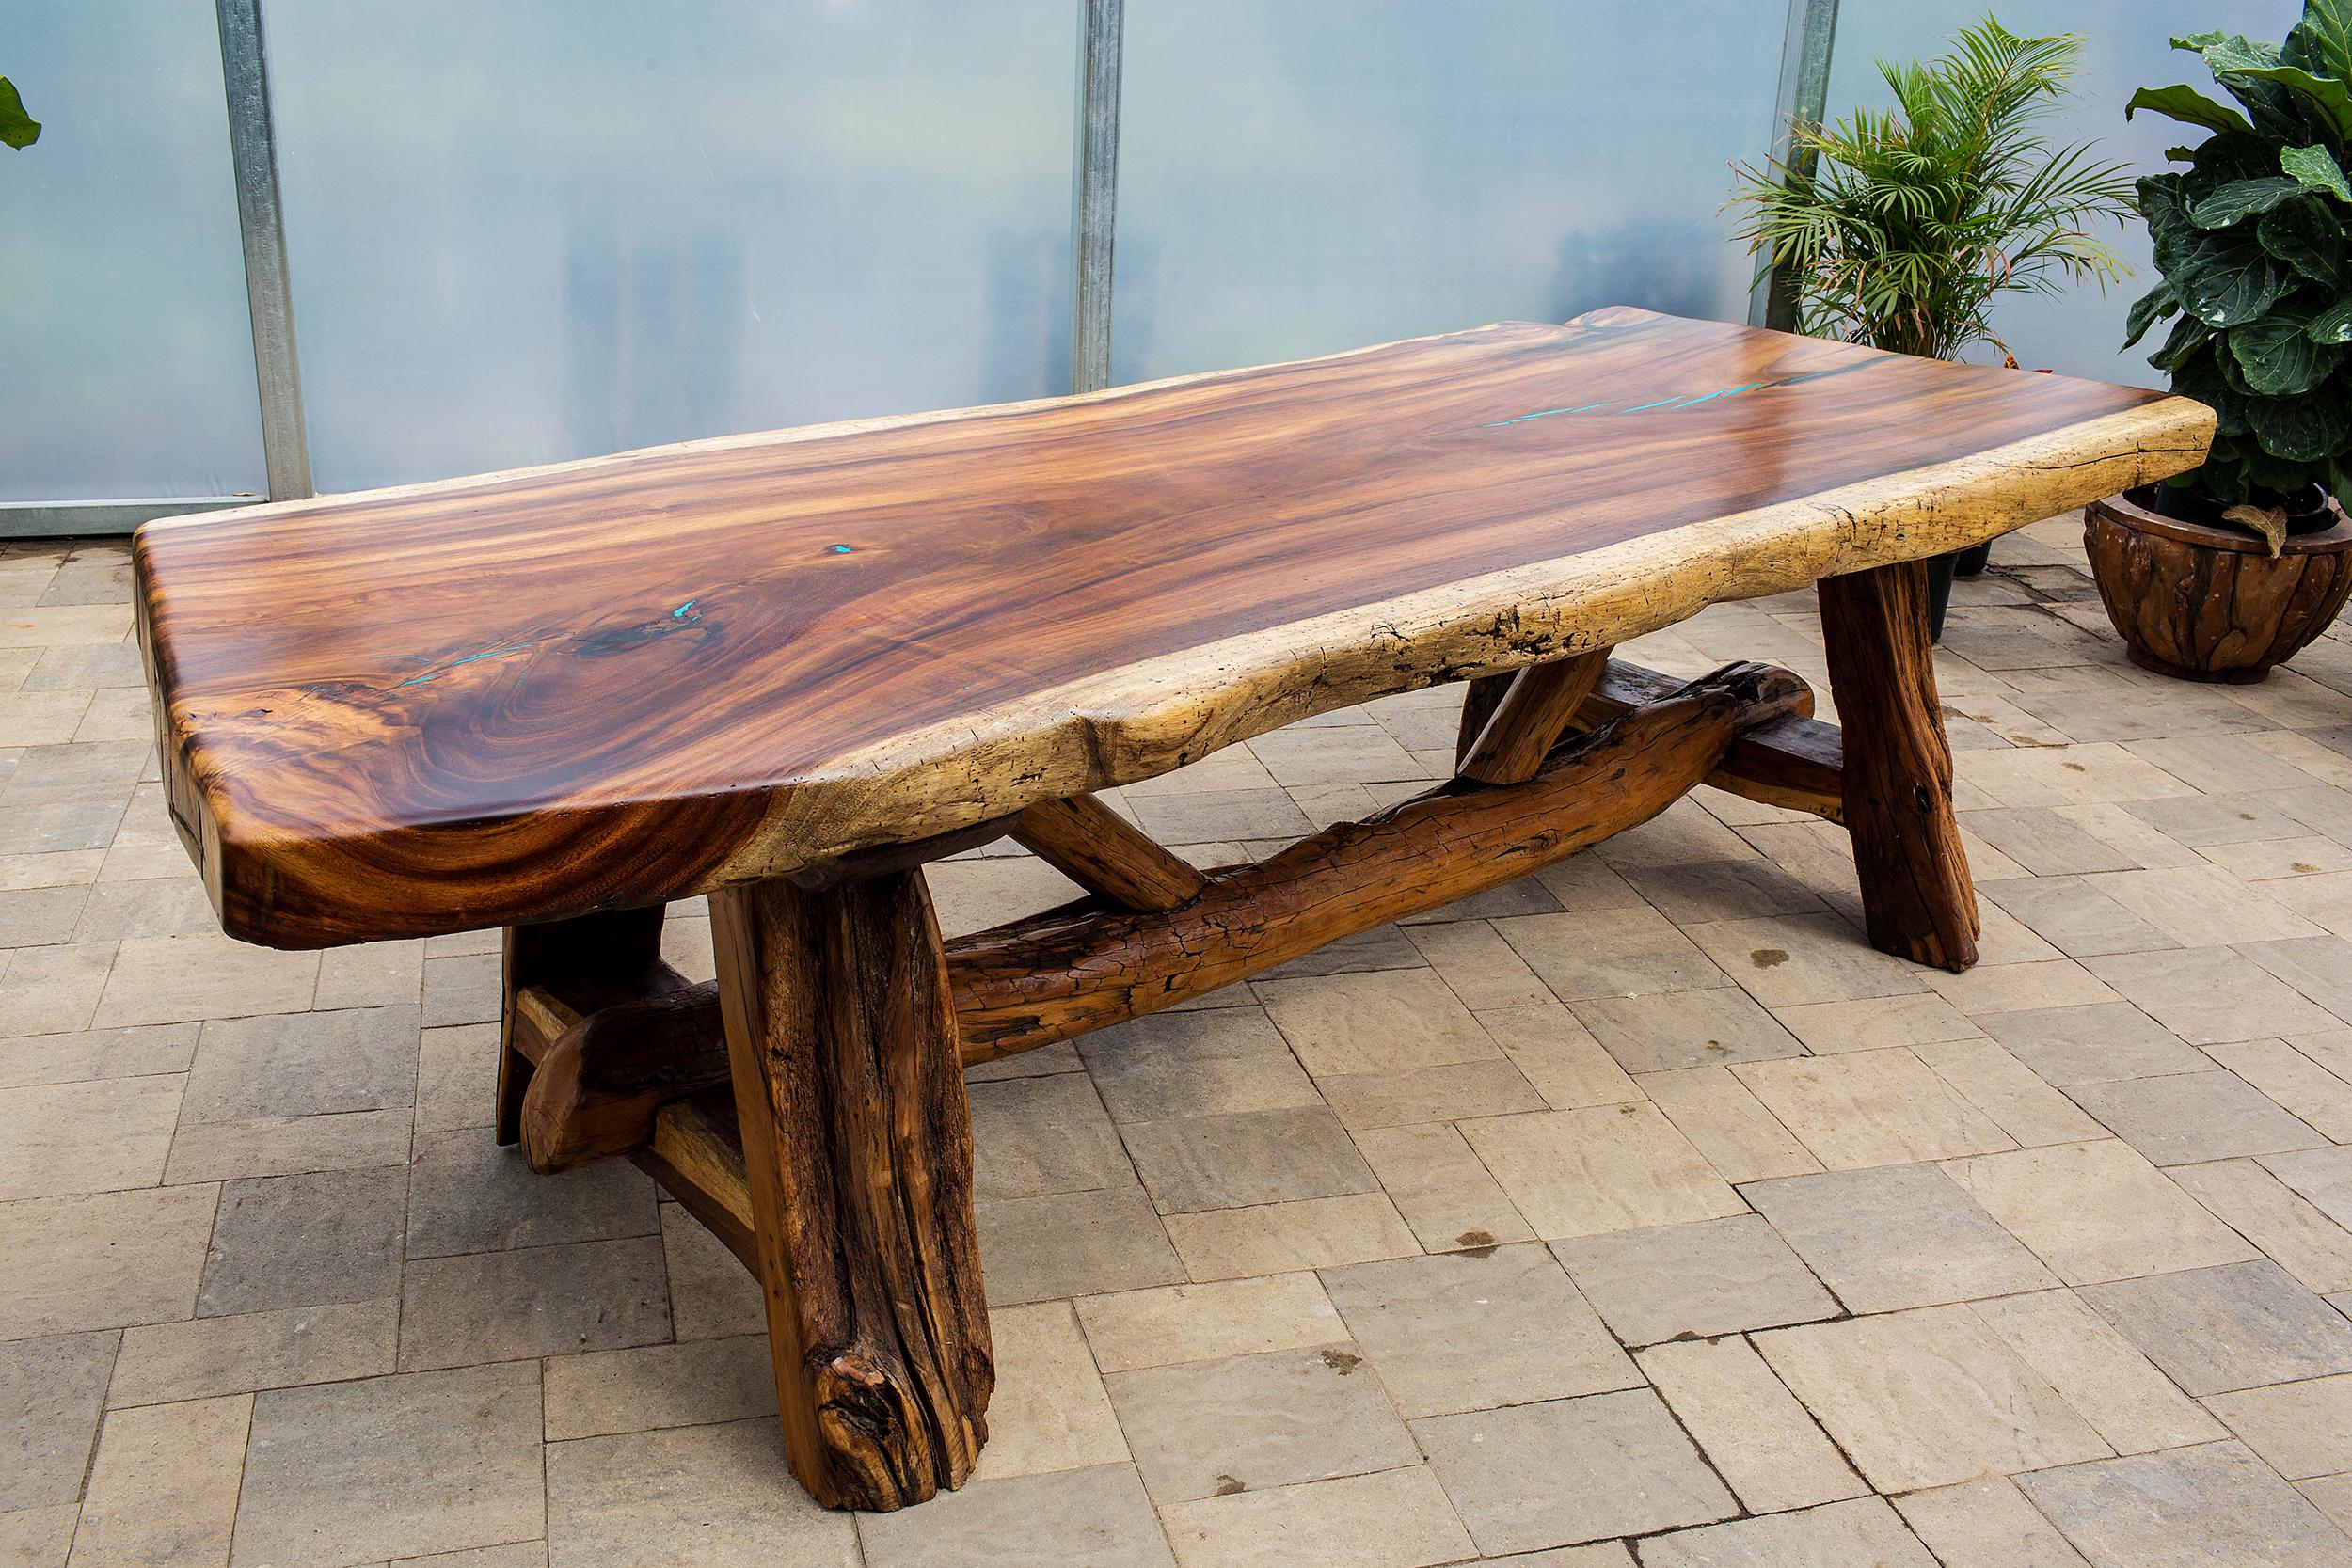 Live Edge Wood Furniture in DFW Texas (237 of 304).jpg